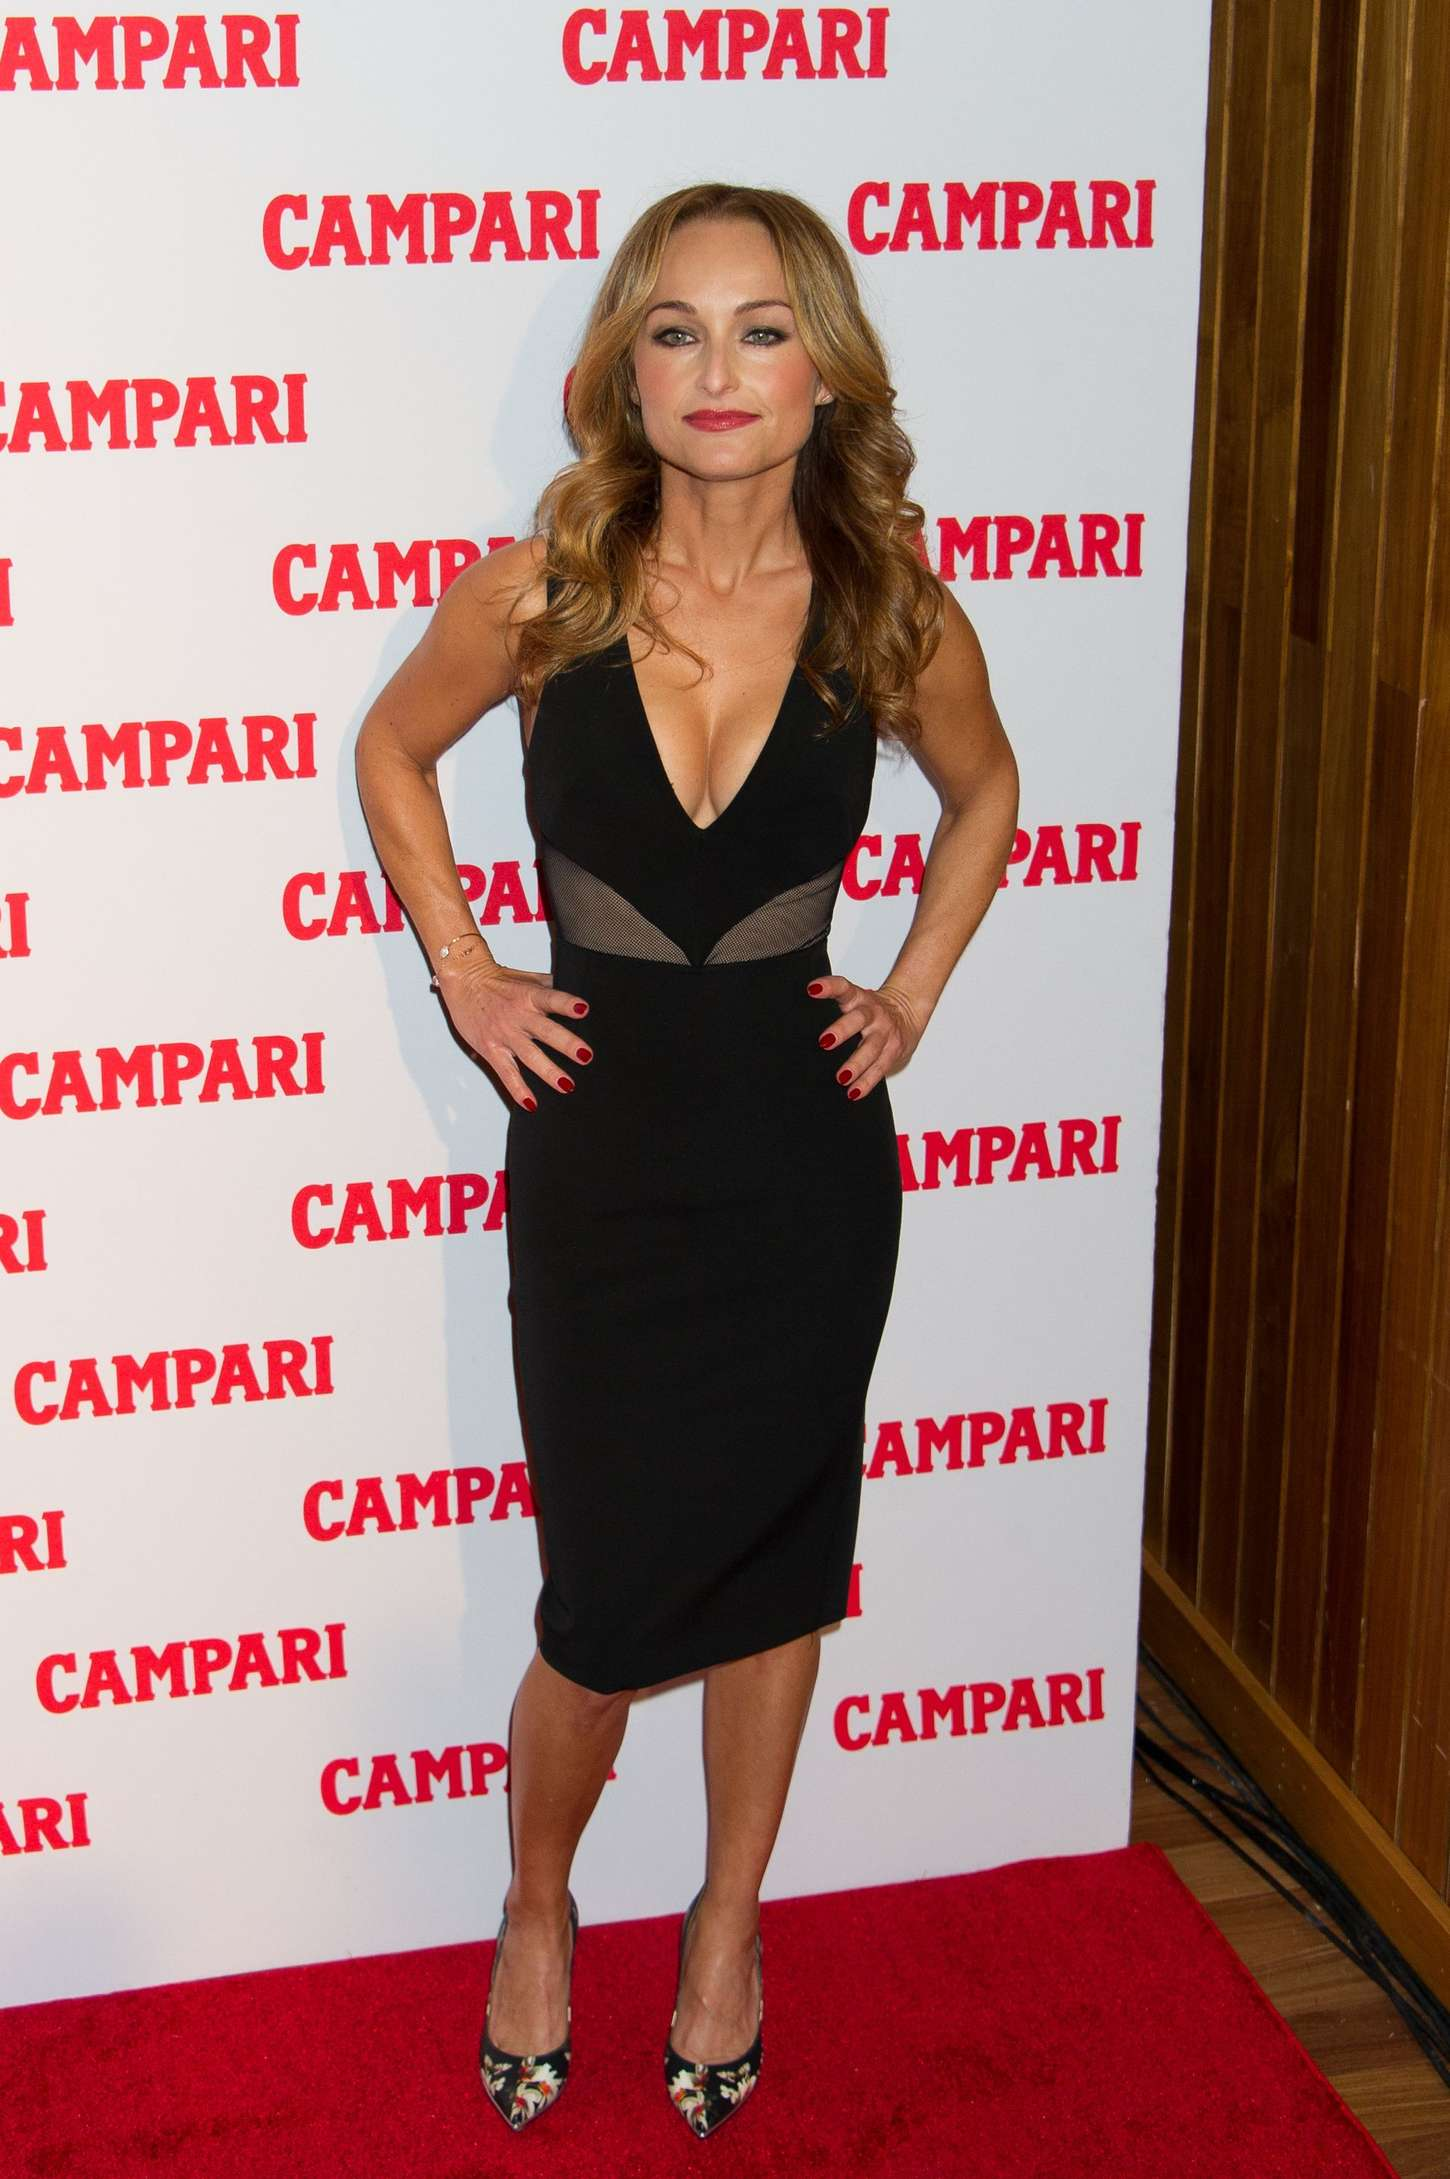 Giada De Laurentiis Campari Launch of the Bittersweet Campaign in New York